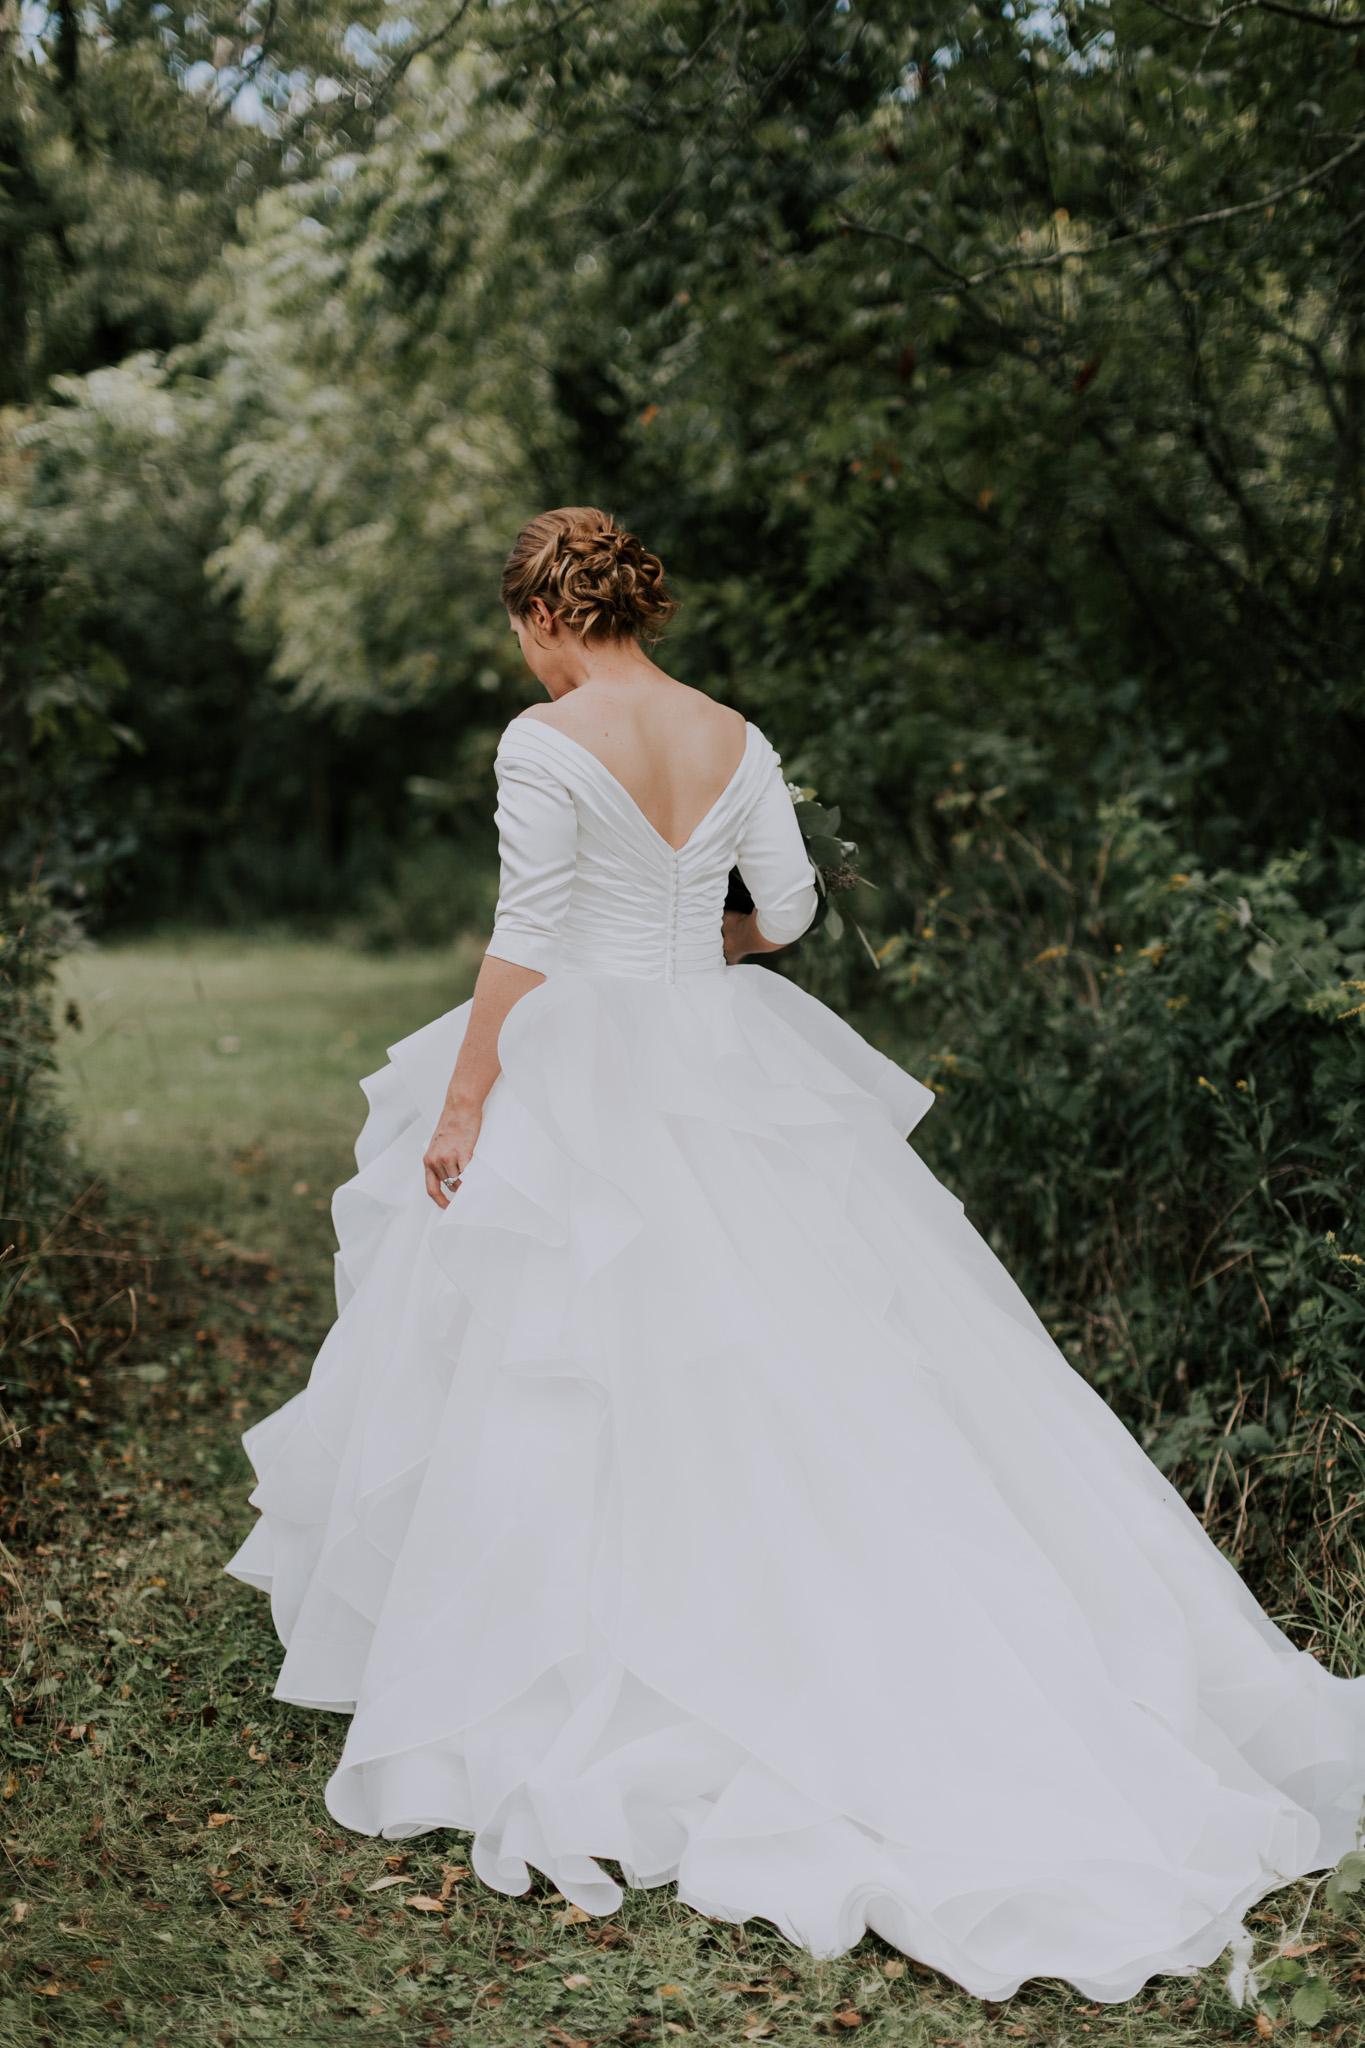 MillCreek-Wilde-Wedding-Barn-Michigan-Eliza-Eric-Vafa-Photo416.jpg